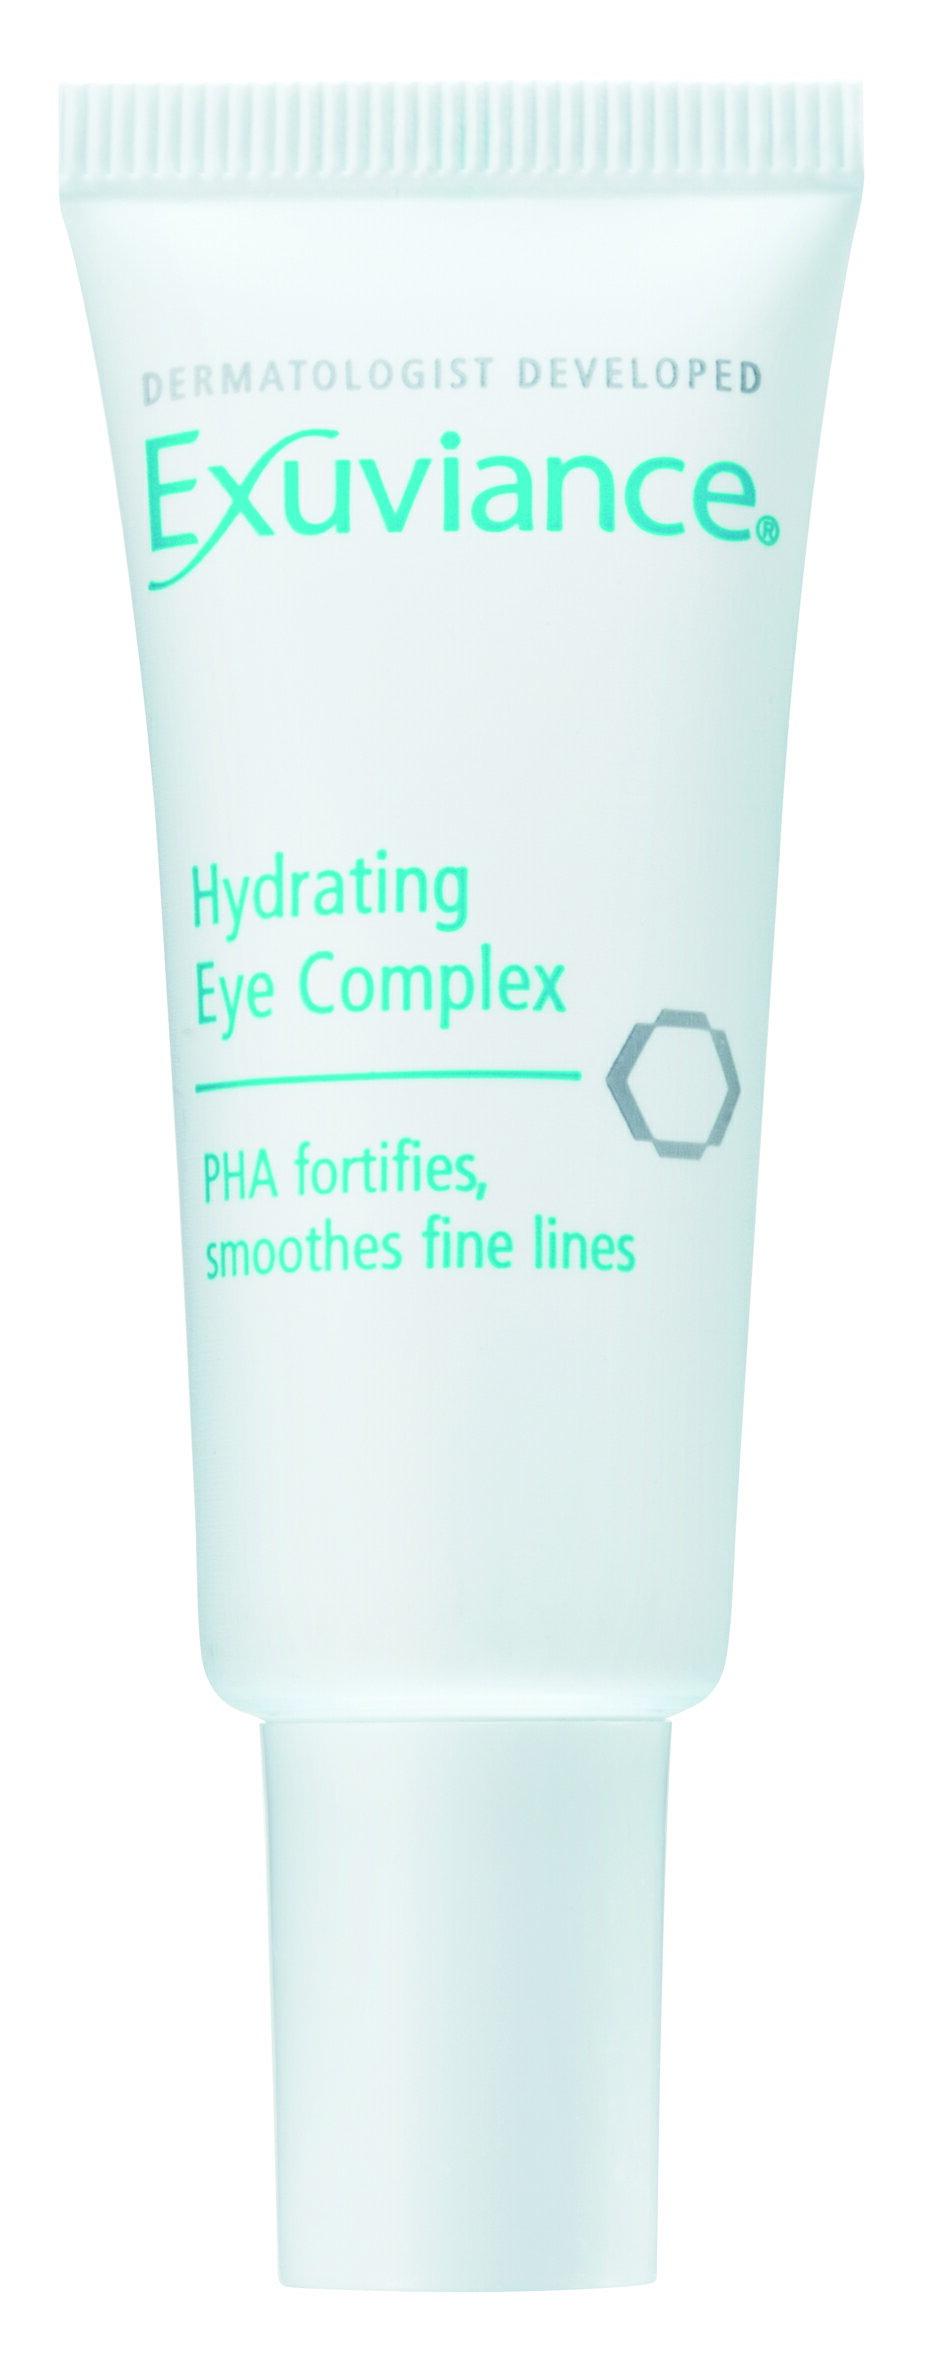 Exuviance愛思妍頂級潤澤撫紋眼霜Hydrating Eye Complex 15g [美十樂藥妝保健]